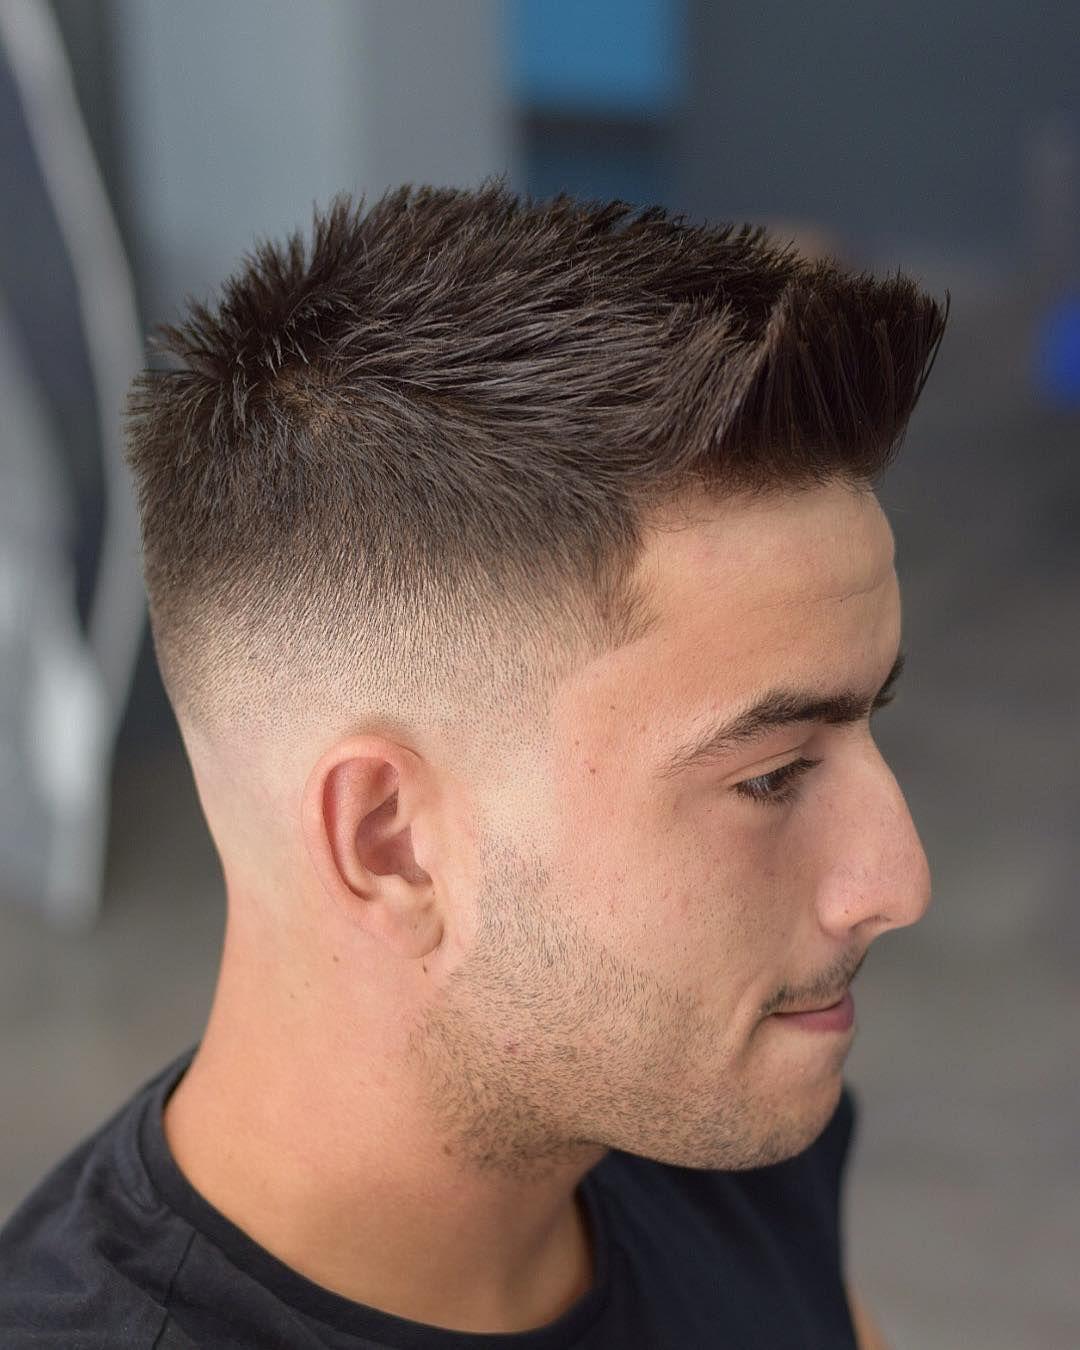 7 Mens Hairstyles For Short Hair Makeup In 2020 Mens Haircuts Short Short Fade Haircut Mens Hairstyles Short